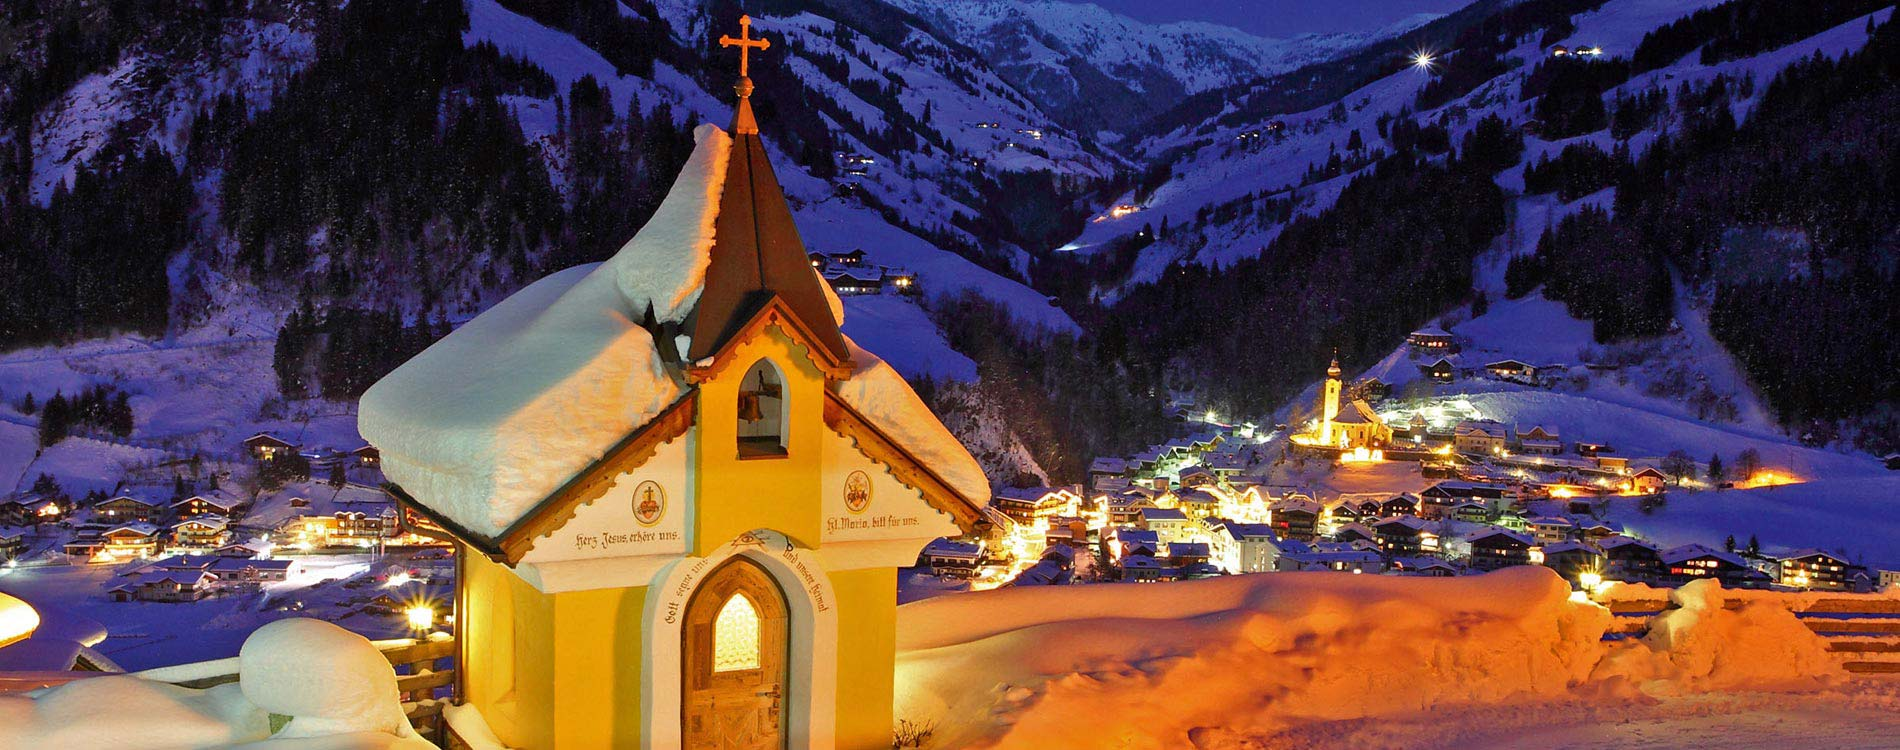 christmas market trip - Niche Destinations 4-star-superior hotel GROSSARLER HOF chapel at night